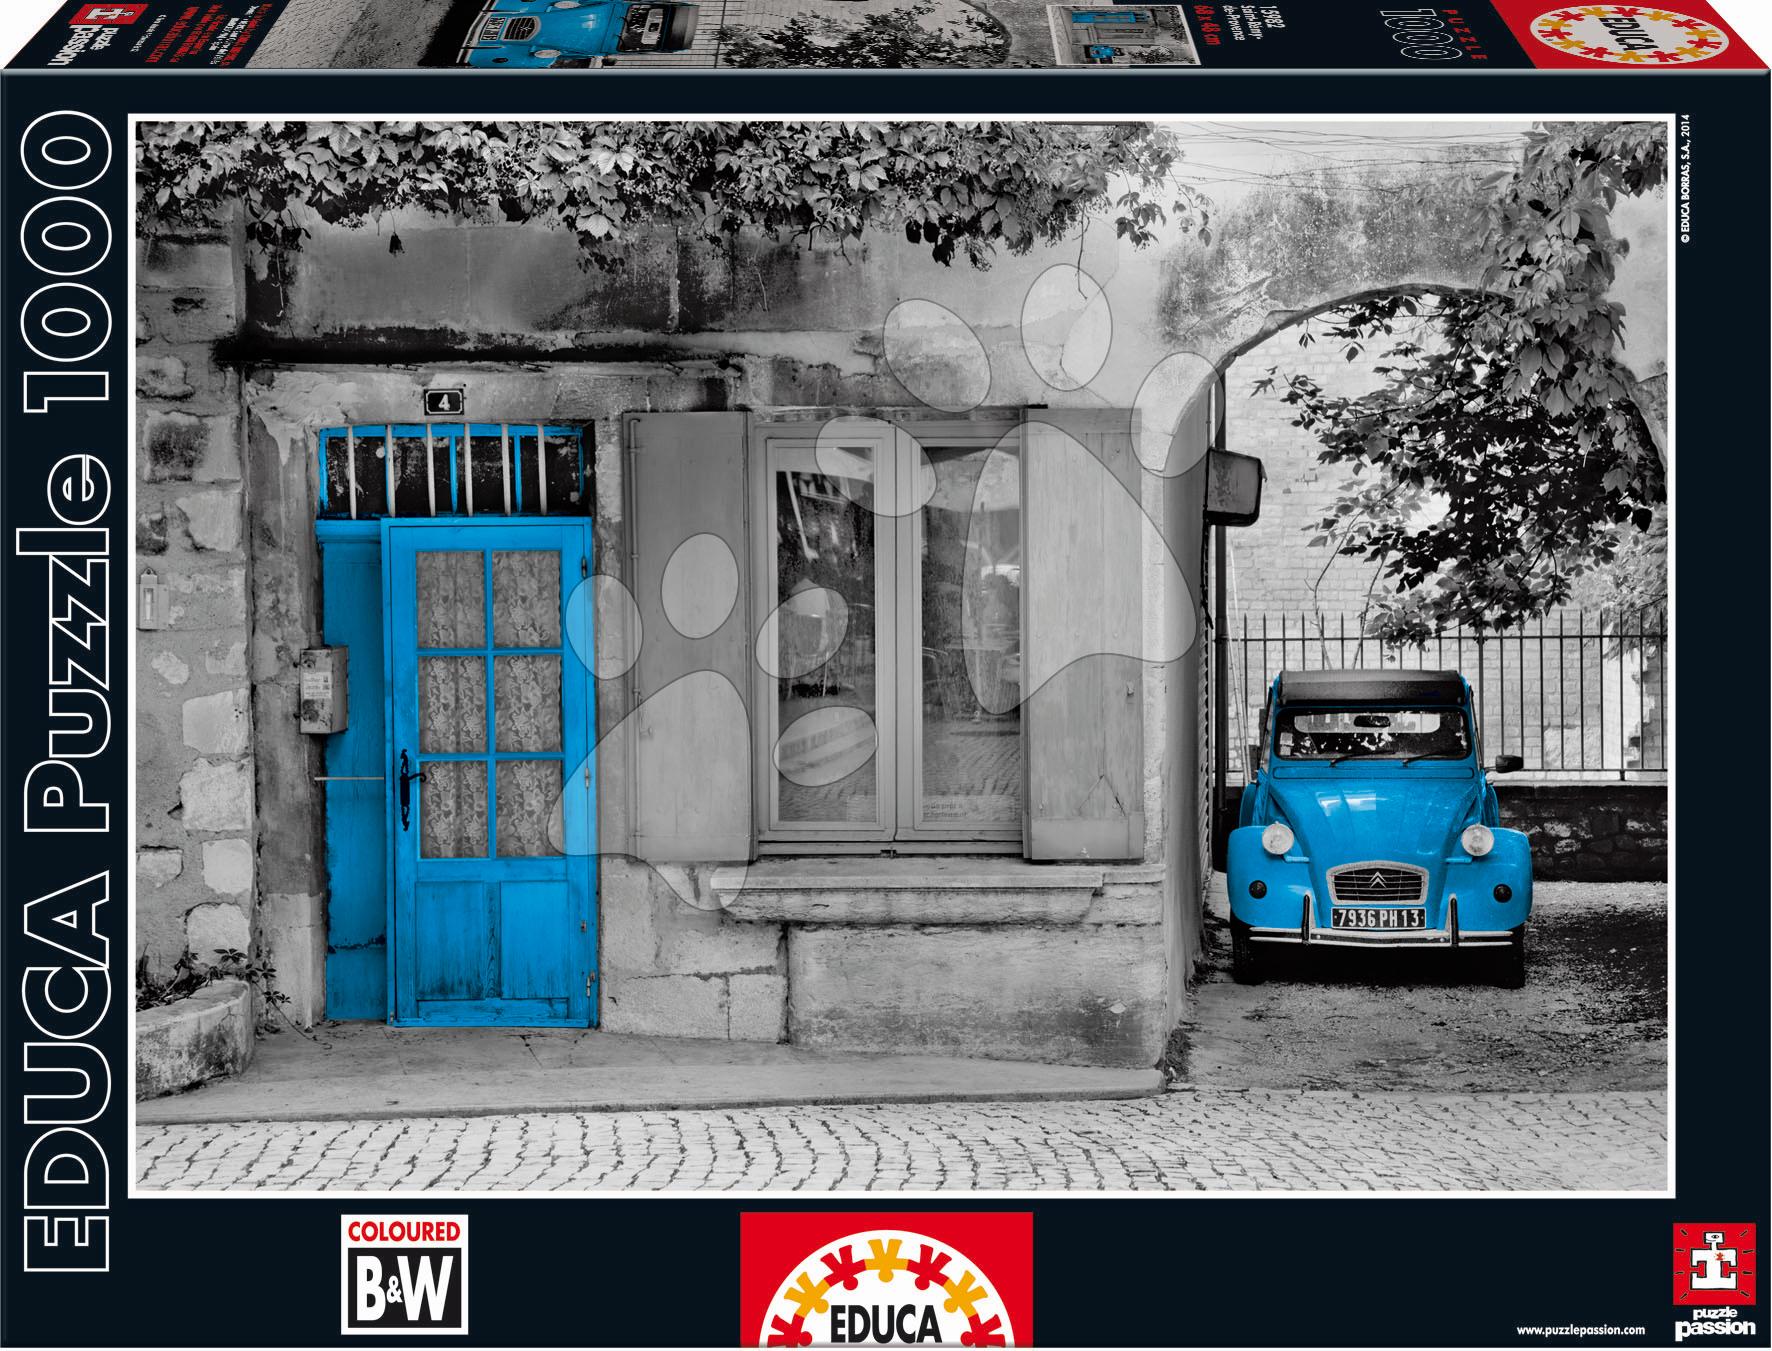 Puzzle 1000 dielne - Puzzle B&W Saint Remy de Provence Educa 1000 dielov od 12 rokov